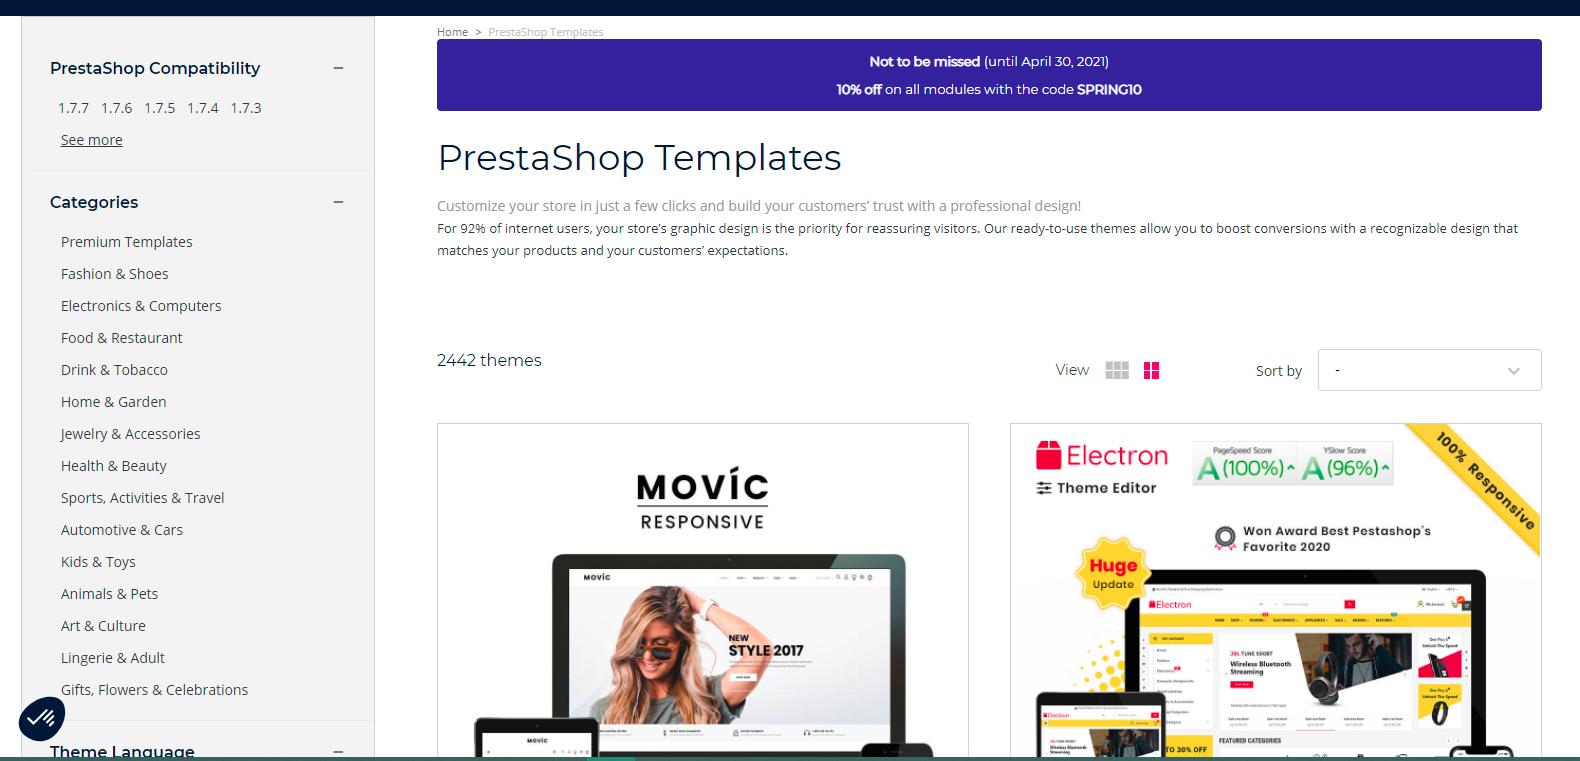 PrestaShop's High Quality and Responsive Themes